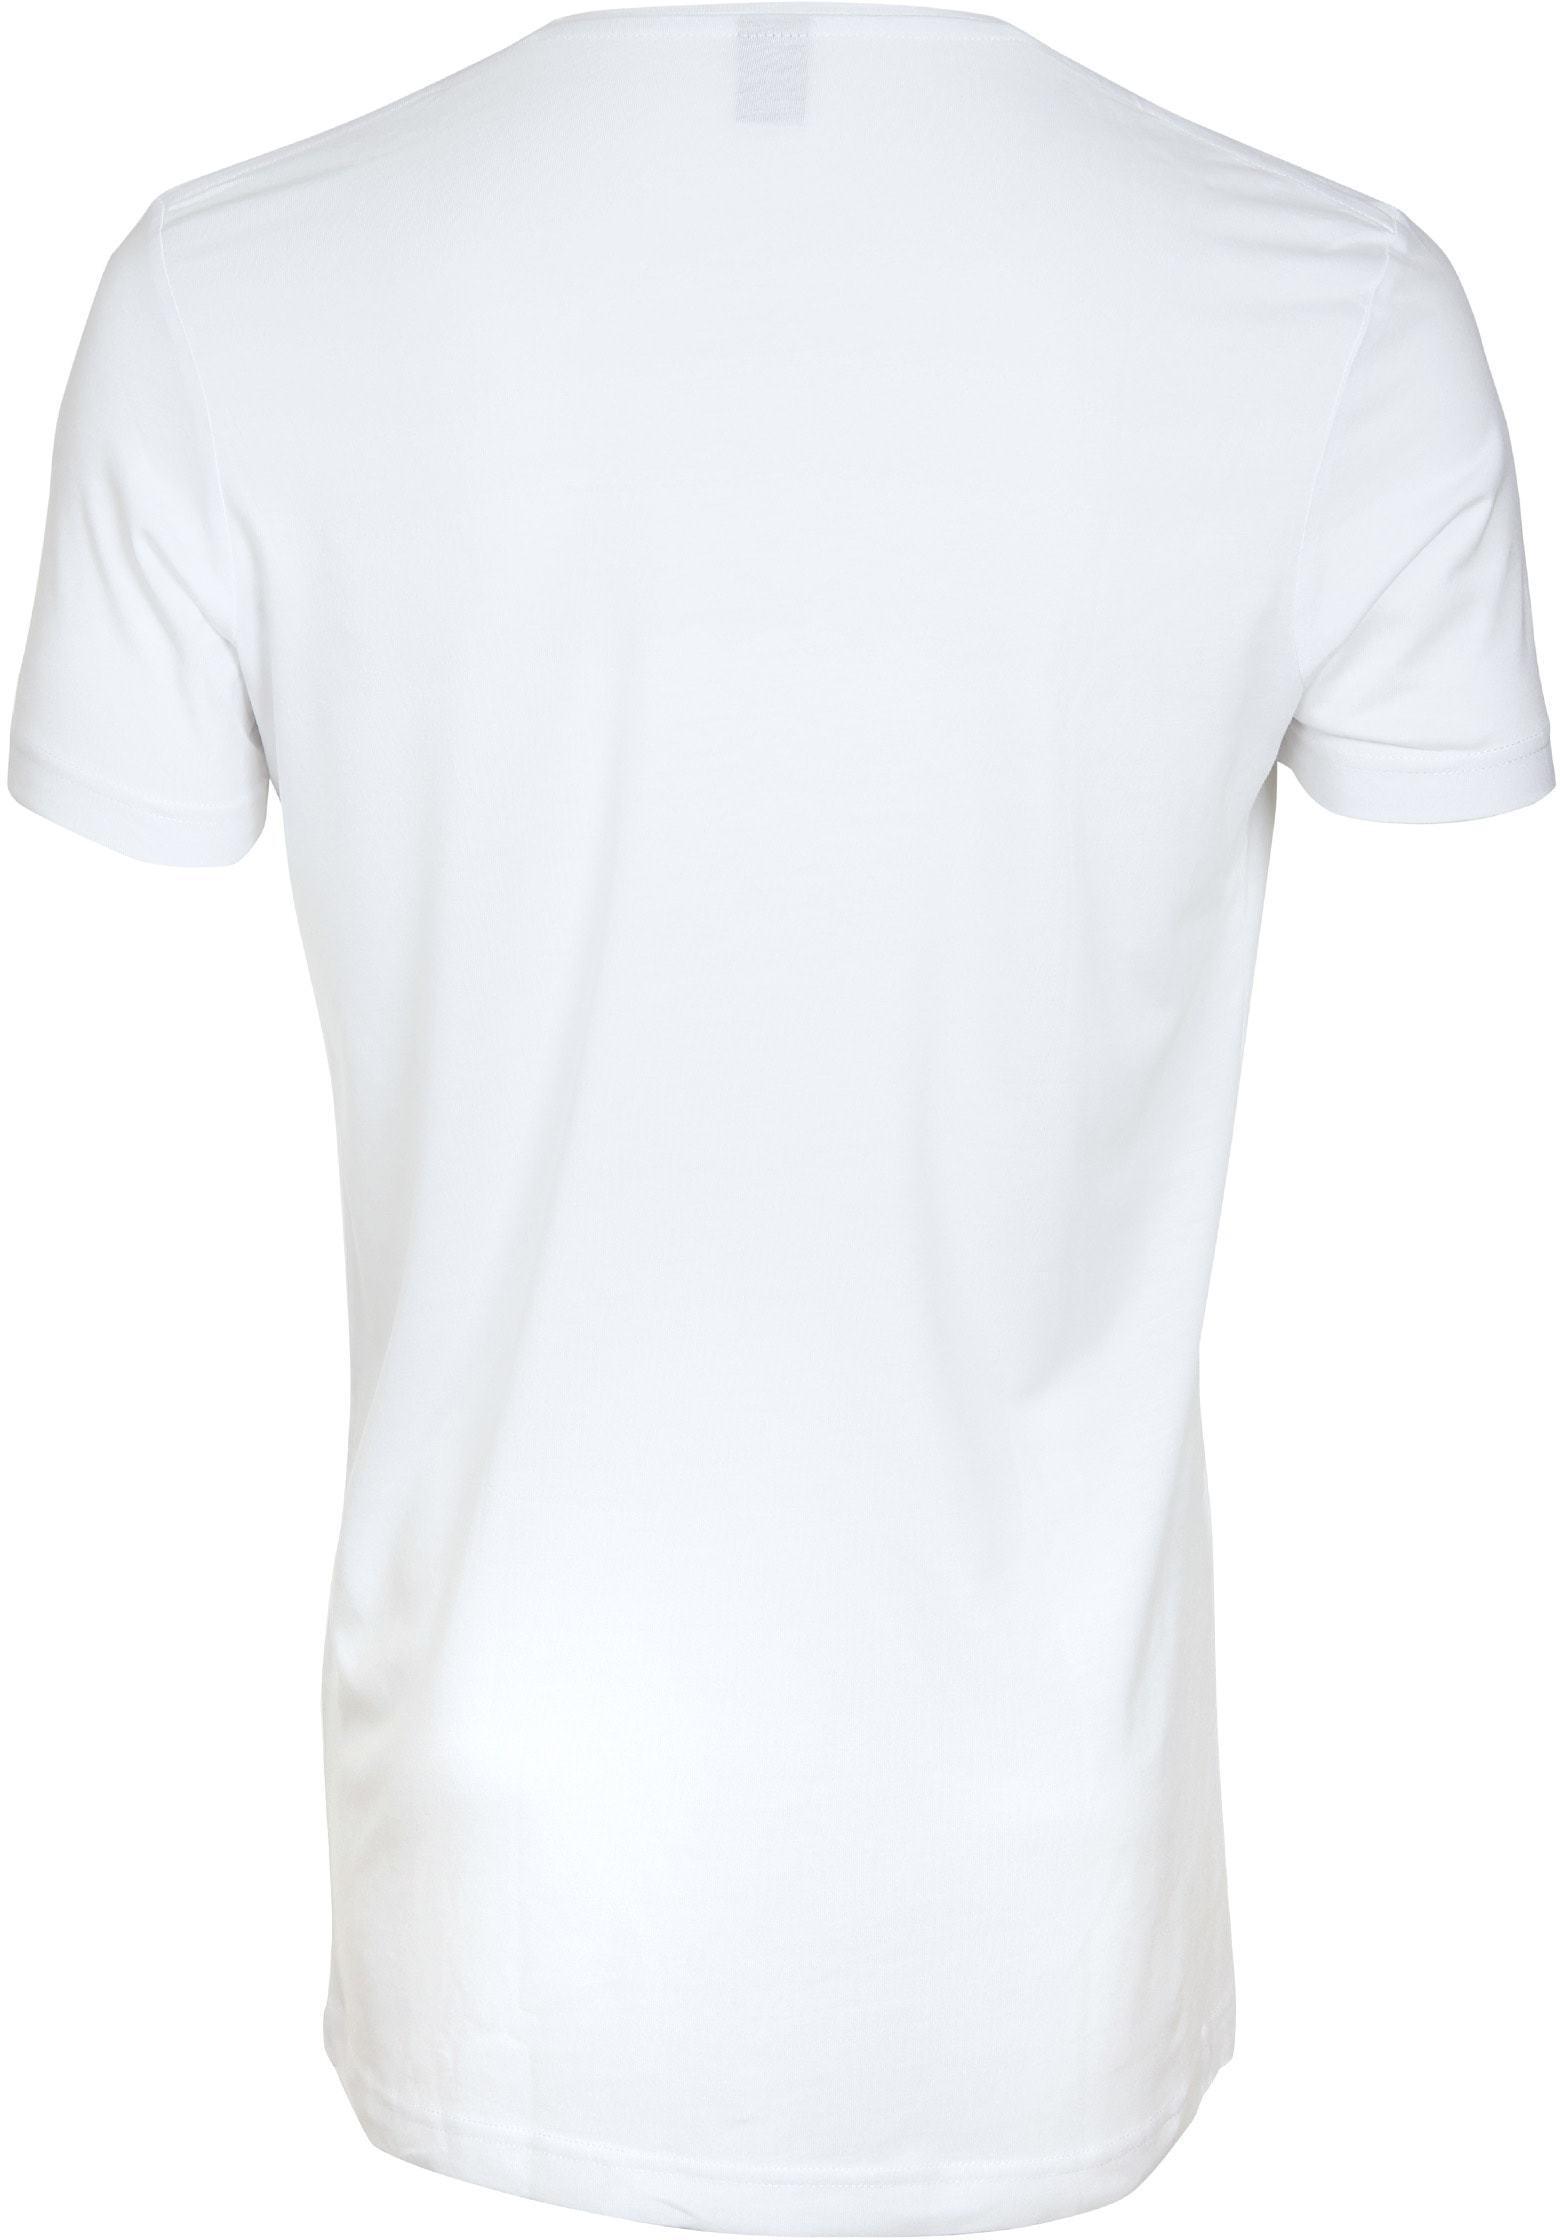 V-Neck 6-Pack Bamboo T-shirts foto 2